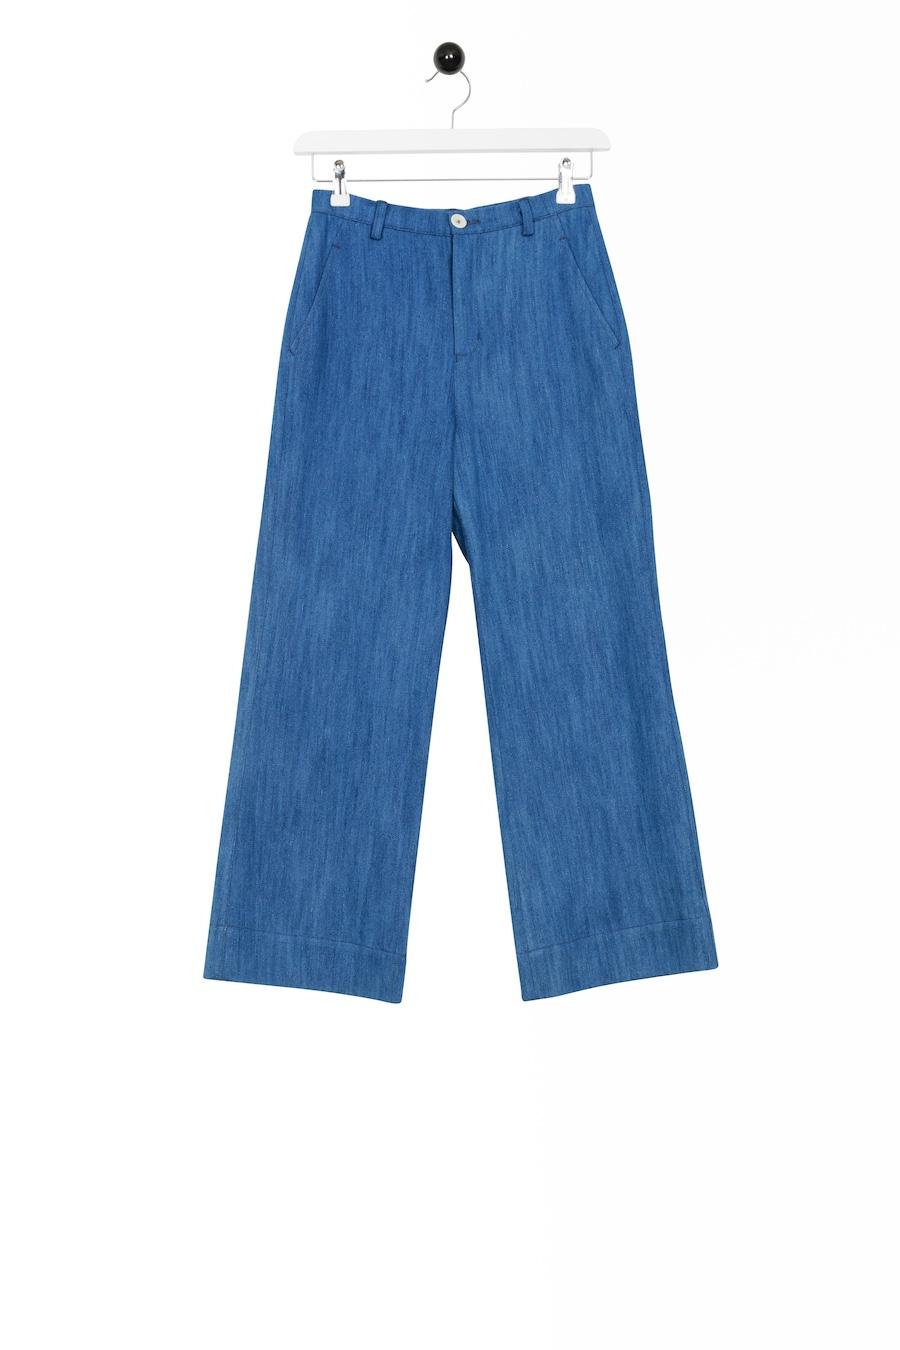 Campiero Trousers